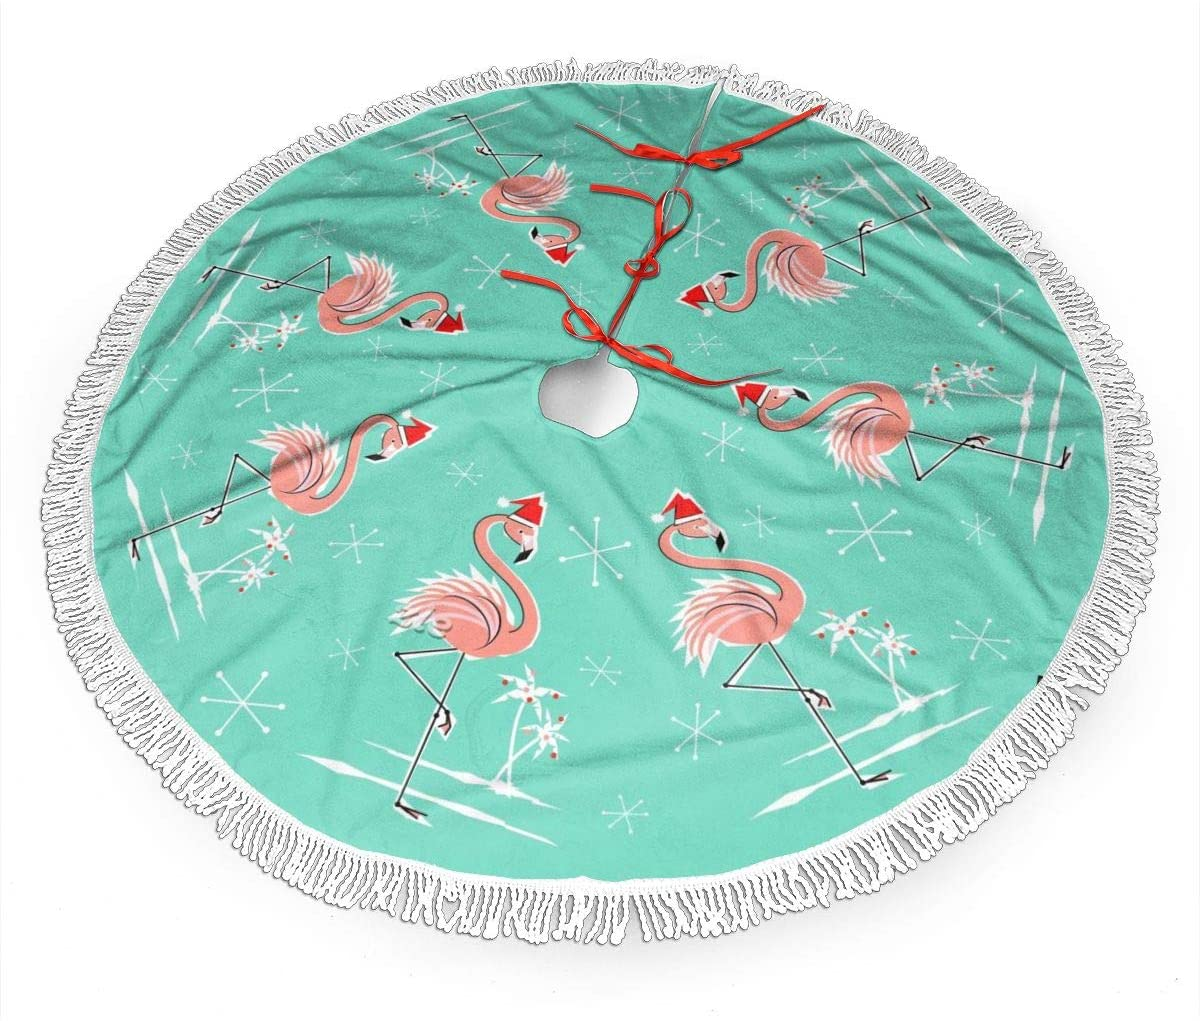 TOLUYOQU Christmas Tree Skirt Christmas_Flamingo Xmas Tree Skirt with Fringed Edge for Holiday Party Decoration